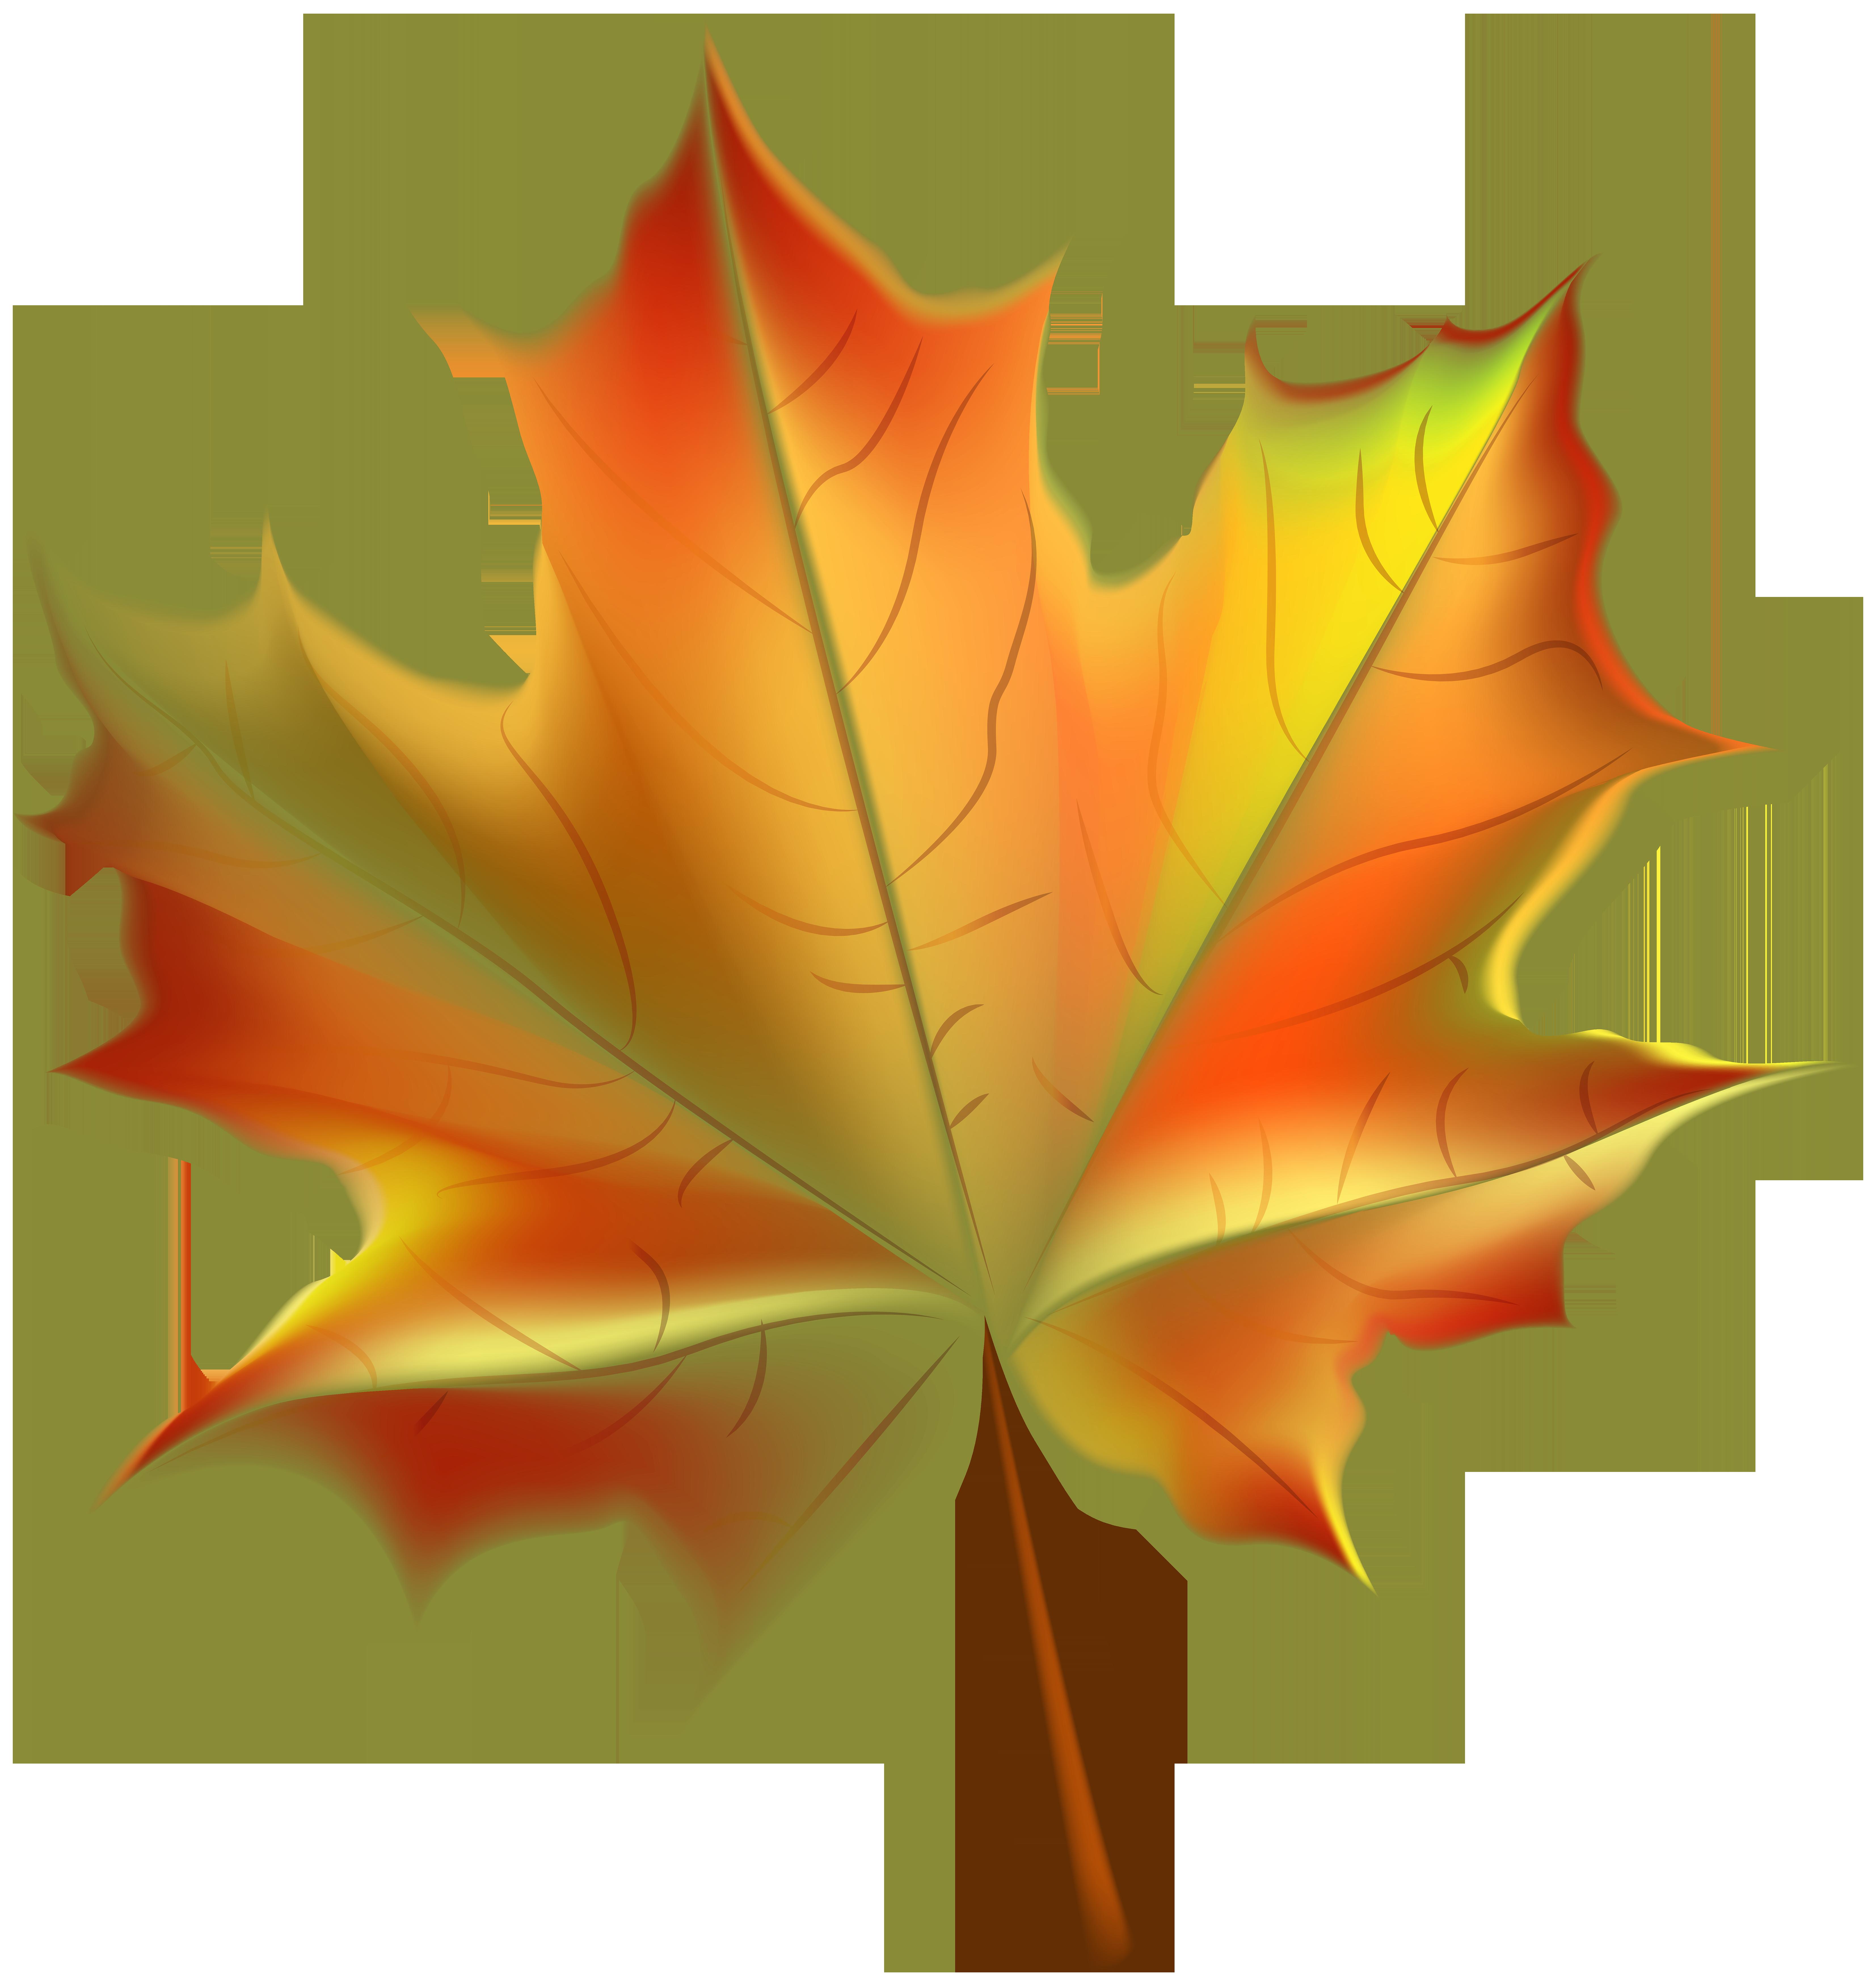 clip art for autumn leaves - photo #49